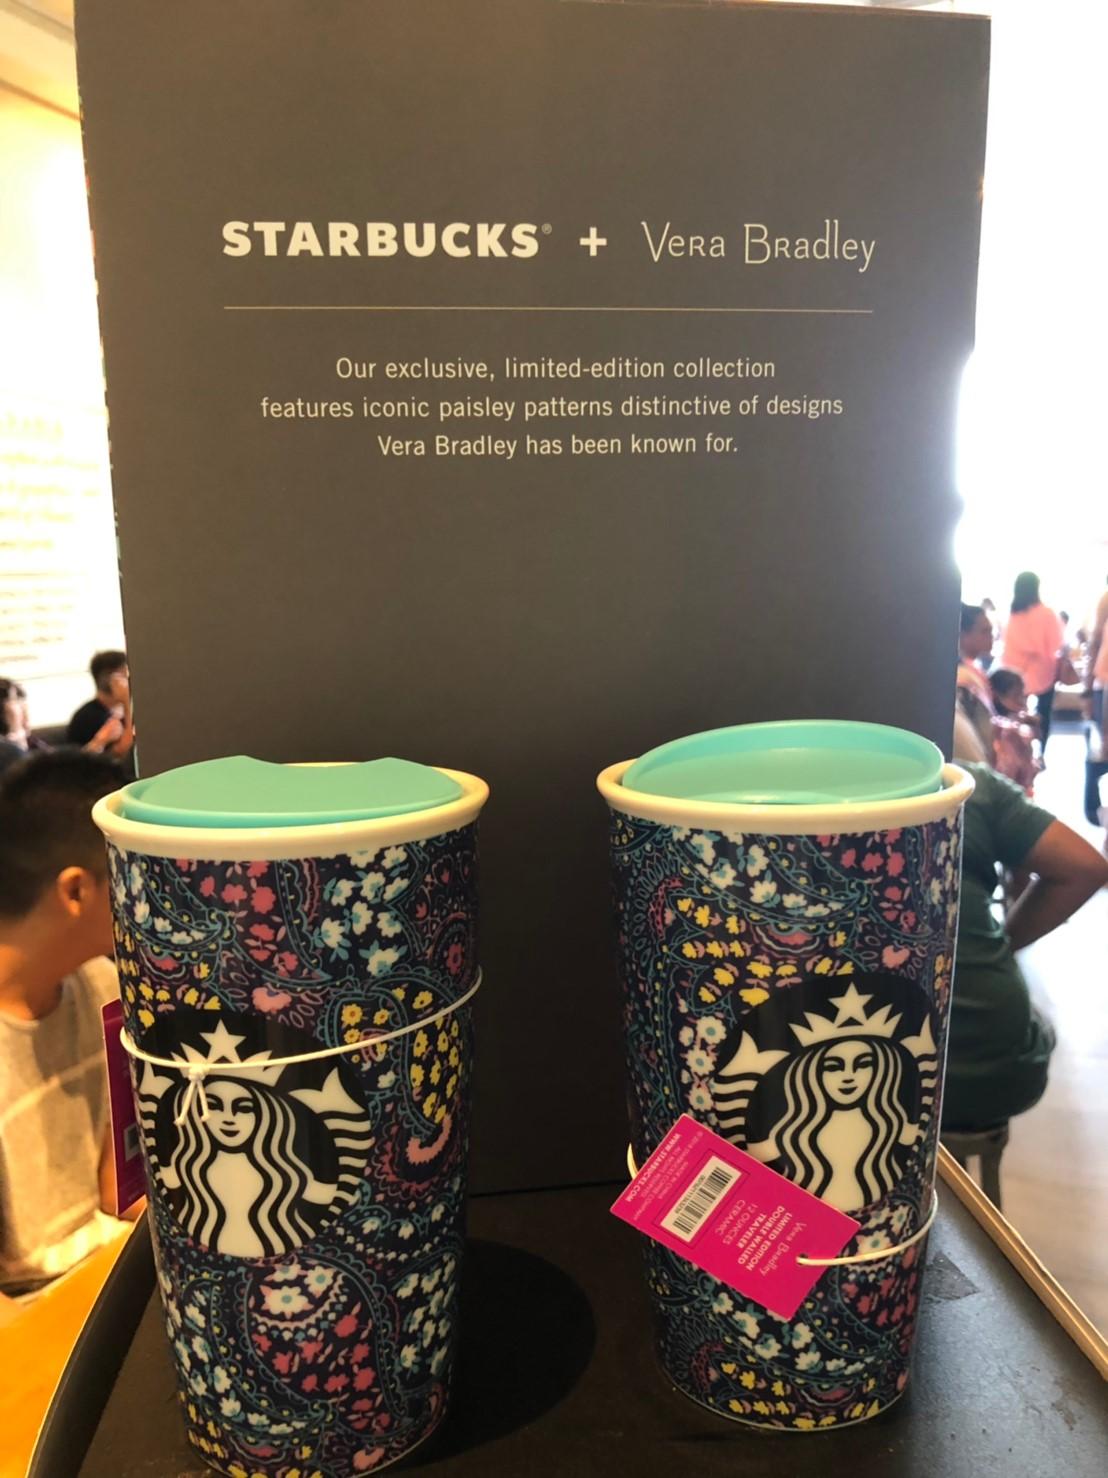 "Cebu_Starbucks_VeraBradleyDWMug_007"""""